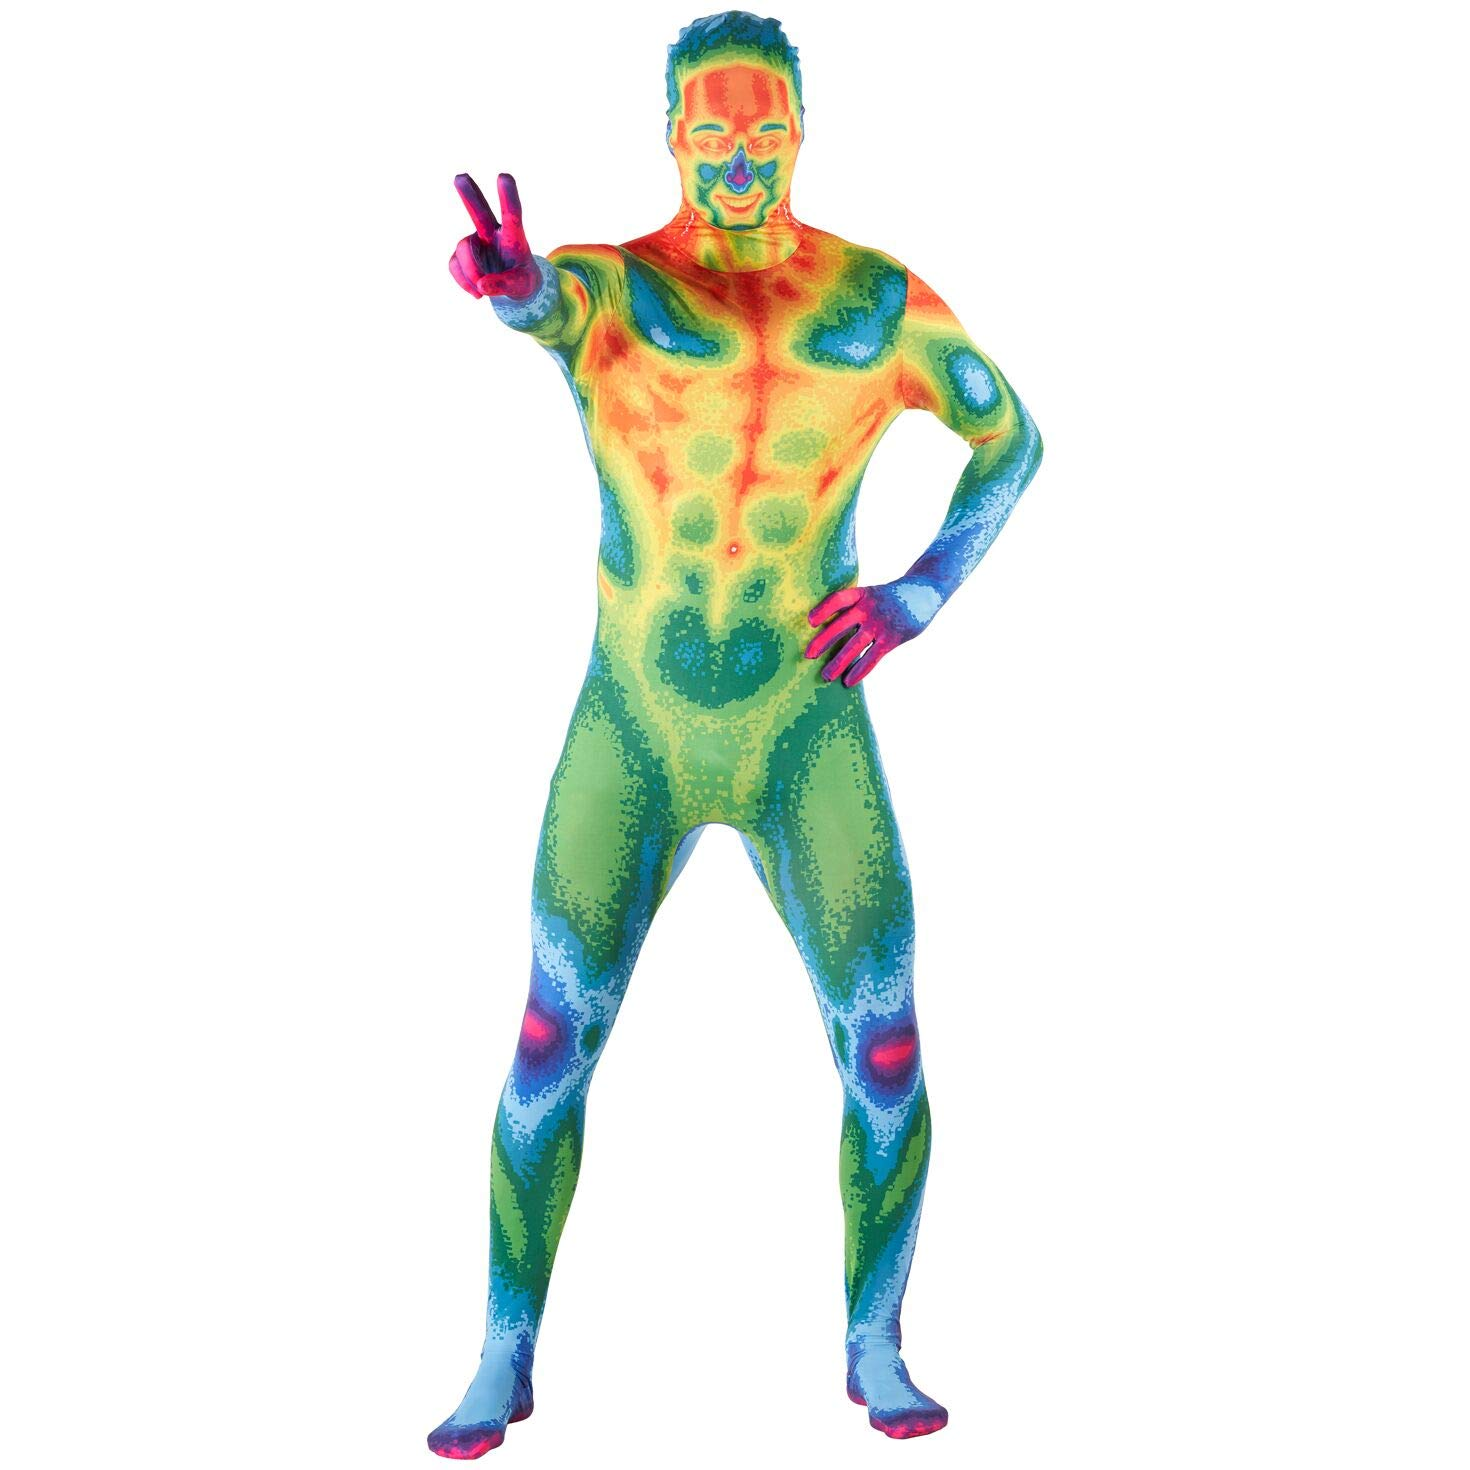 Amazon.com: Morphsuits - Disfraz de Halloween para adultos ...